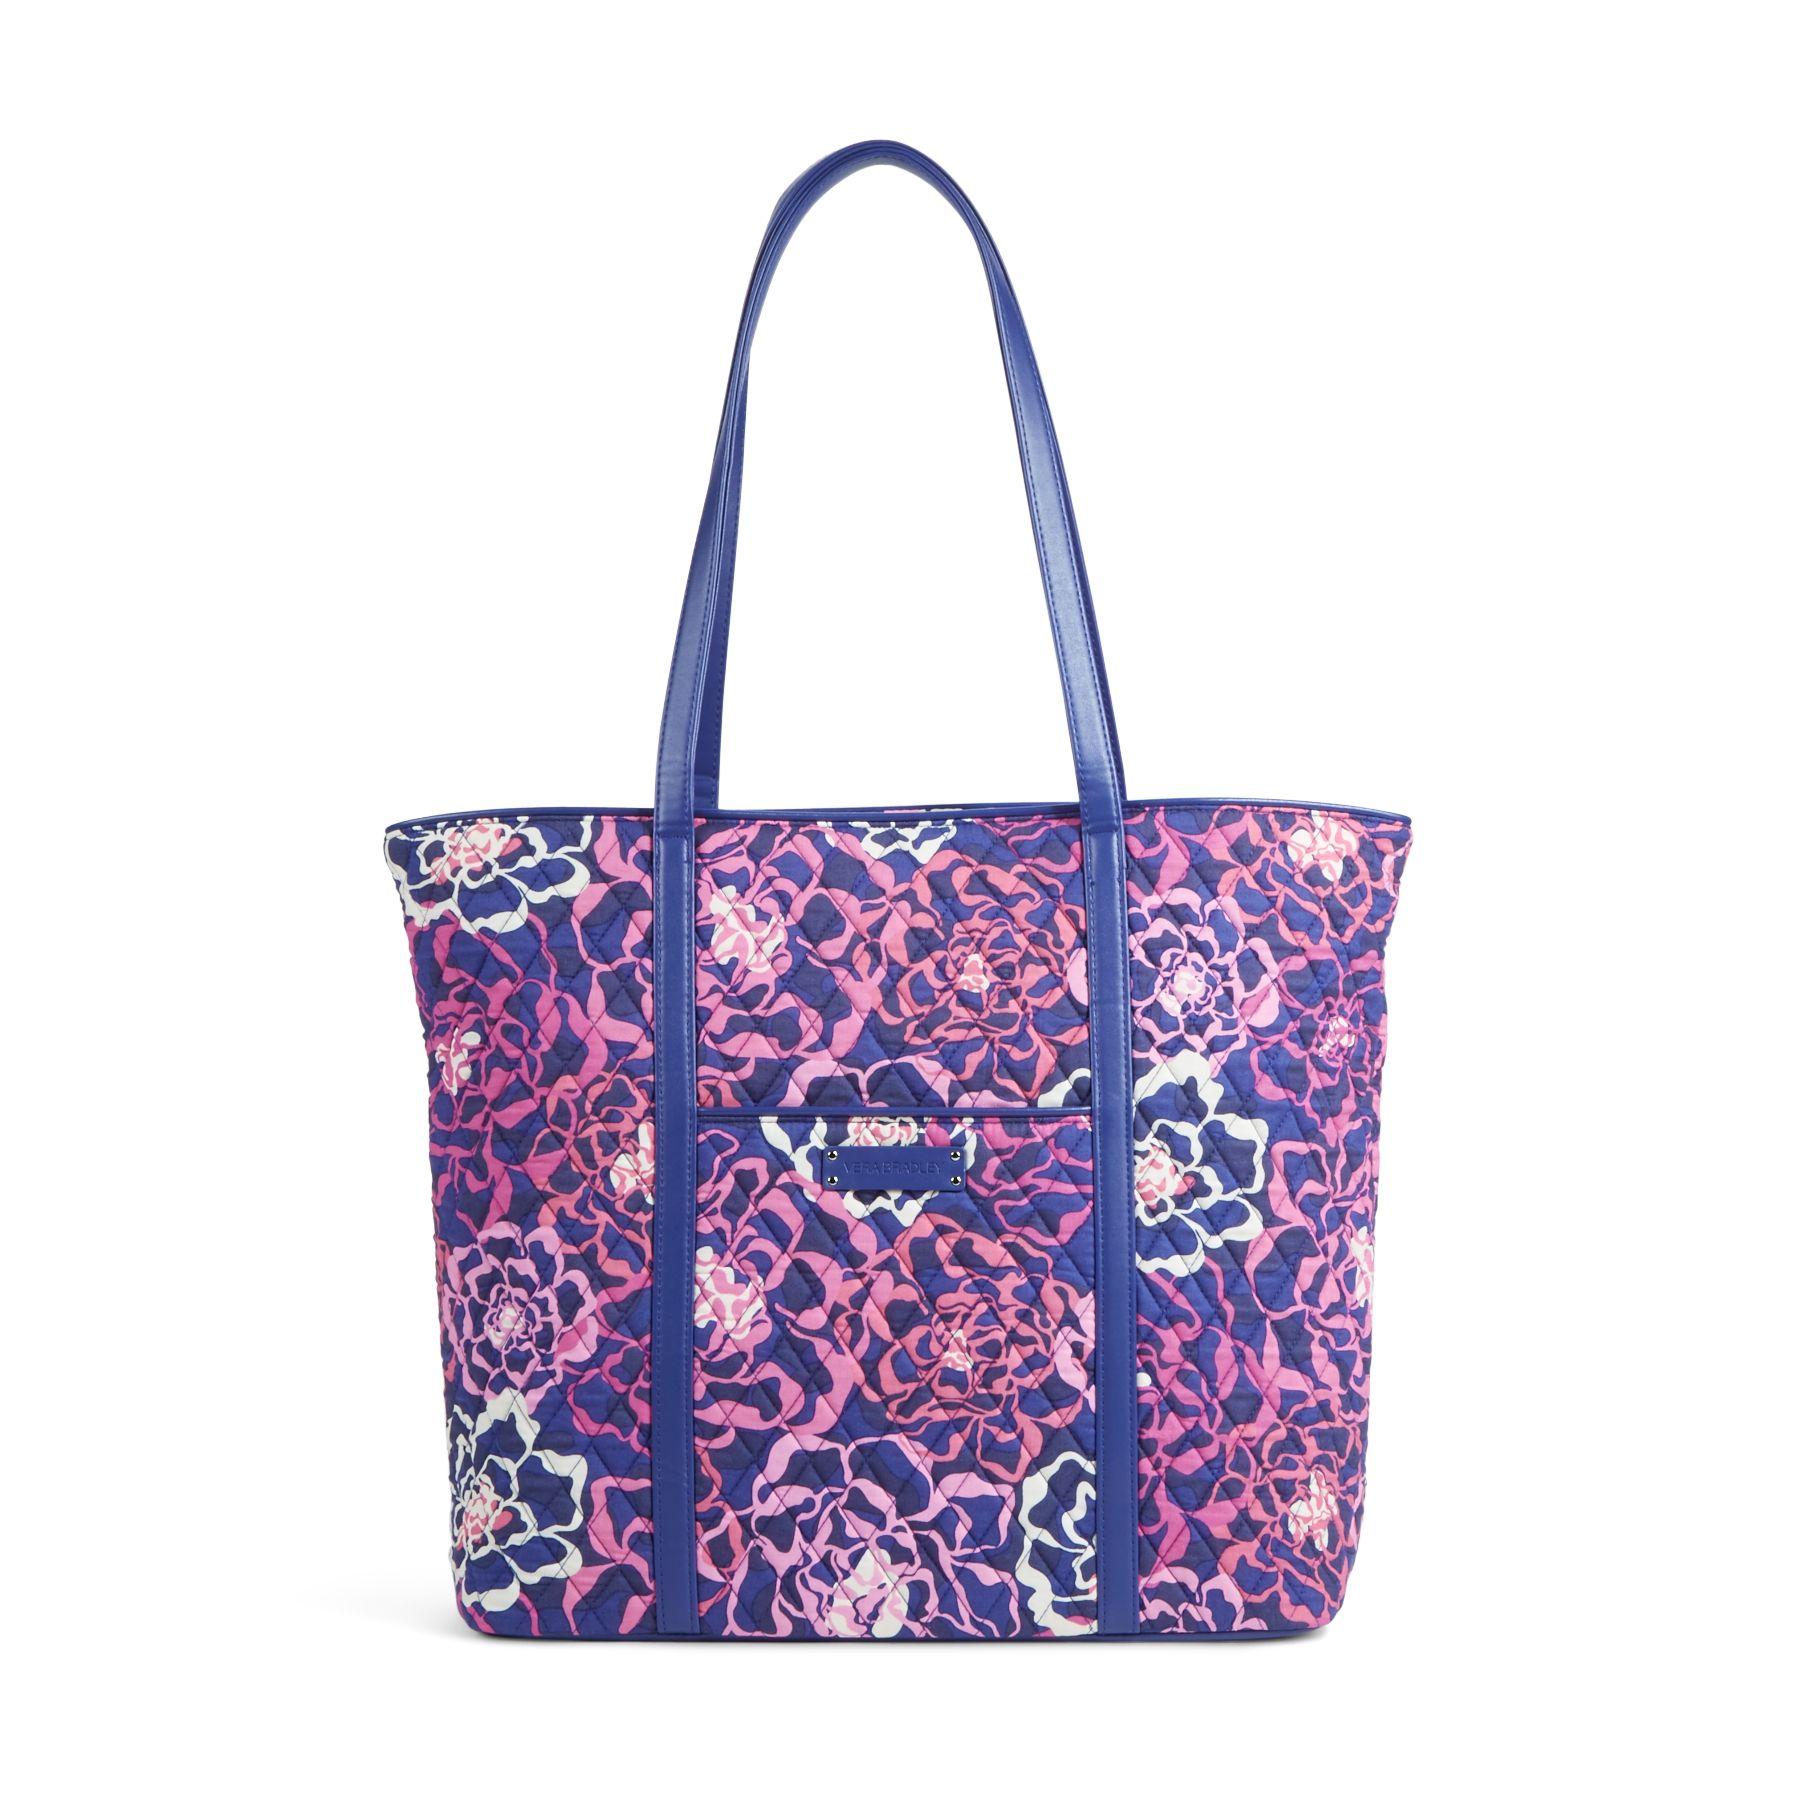 Vera Bradley Trimmed Vera Tote Bag (Multiple Colors)